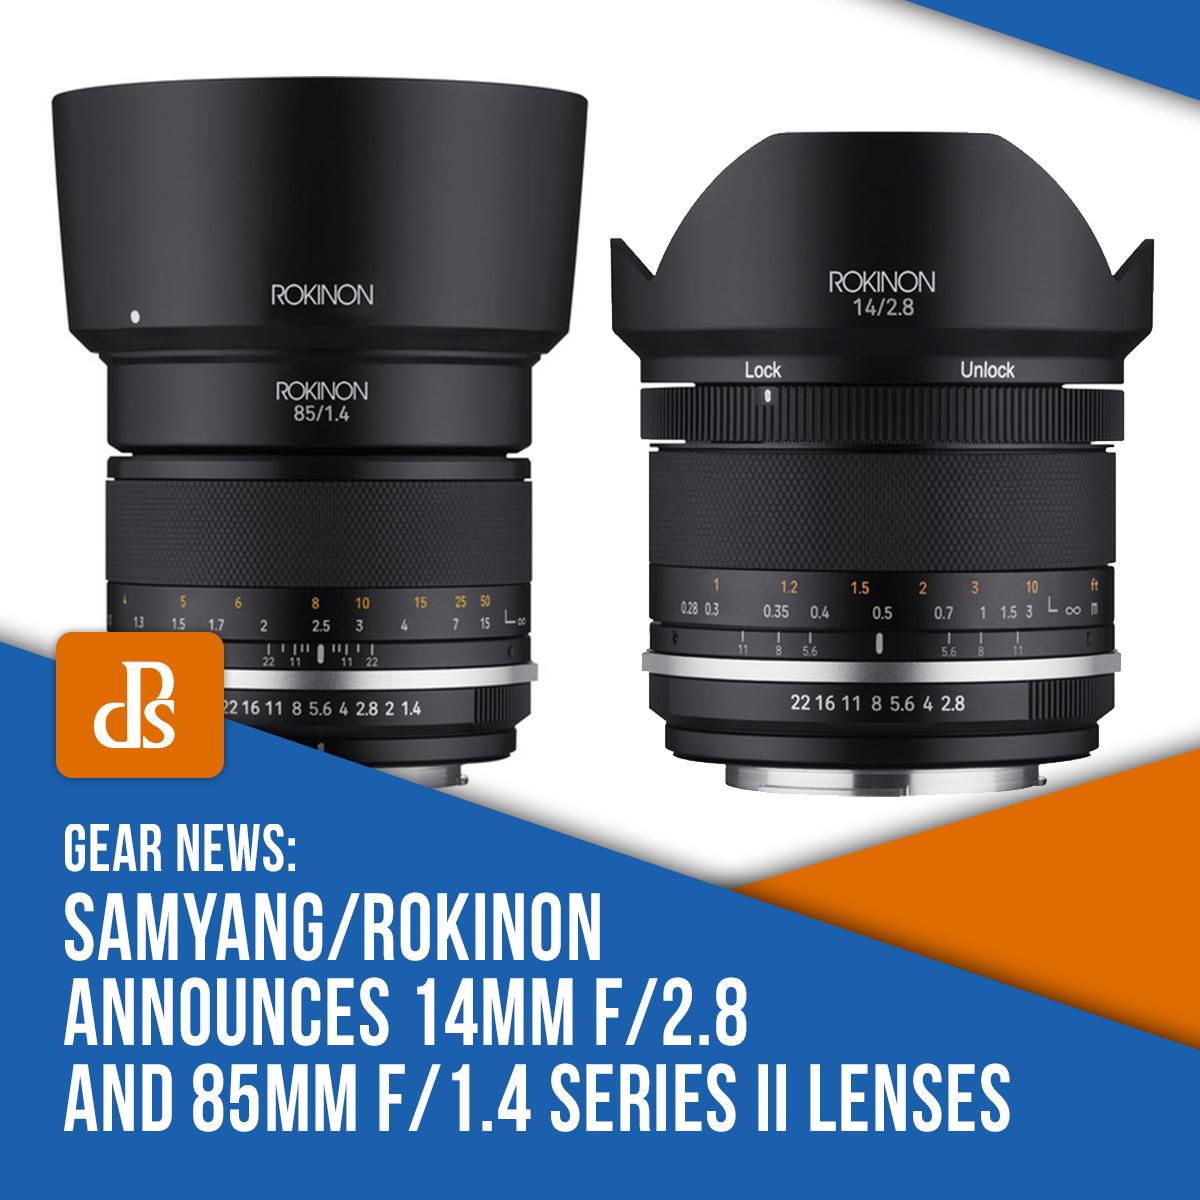 dps-samyang-series-II-lenses